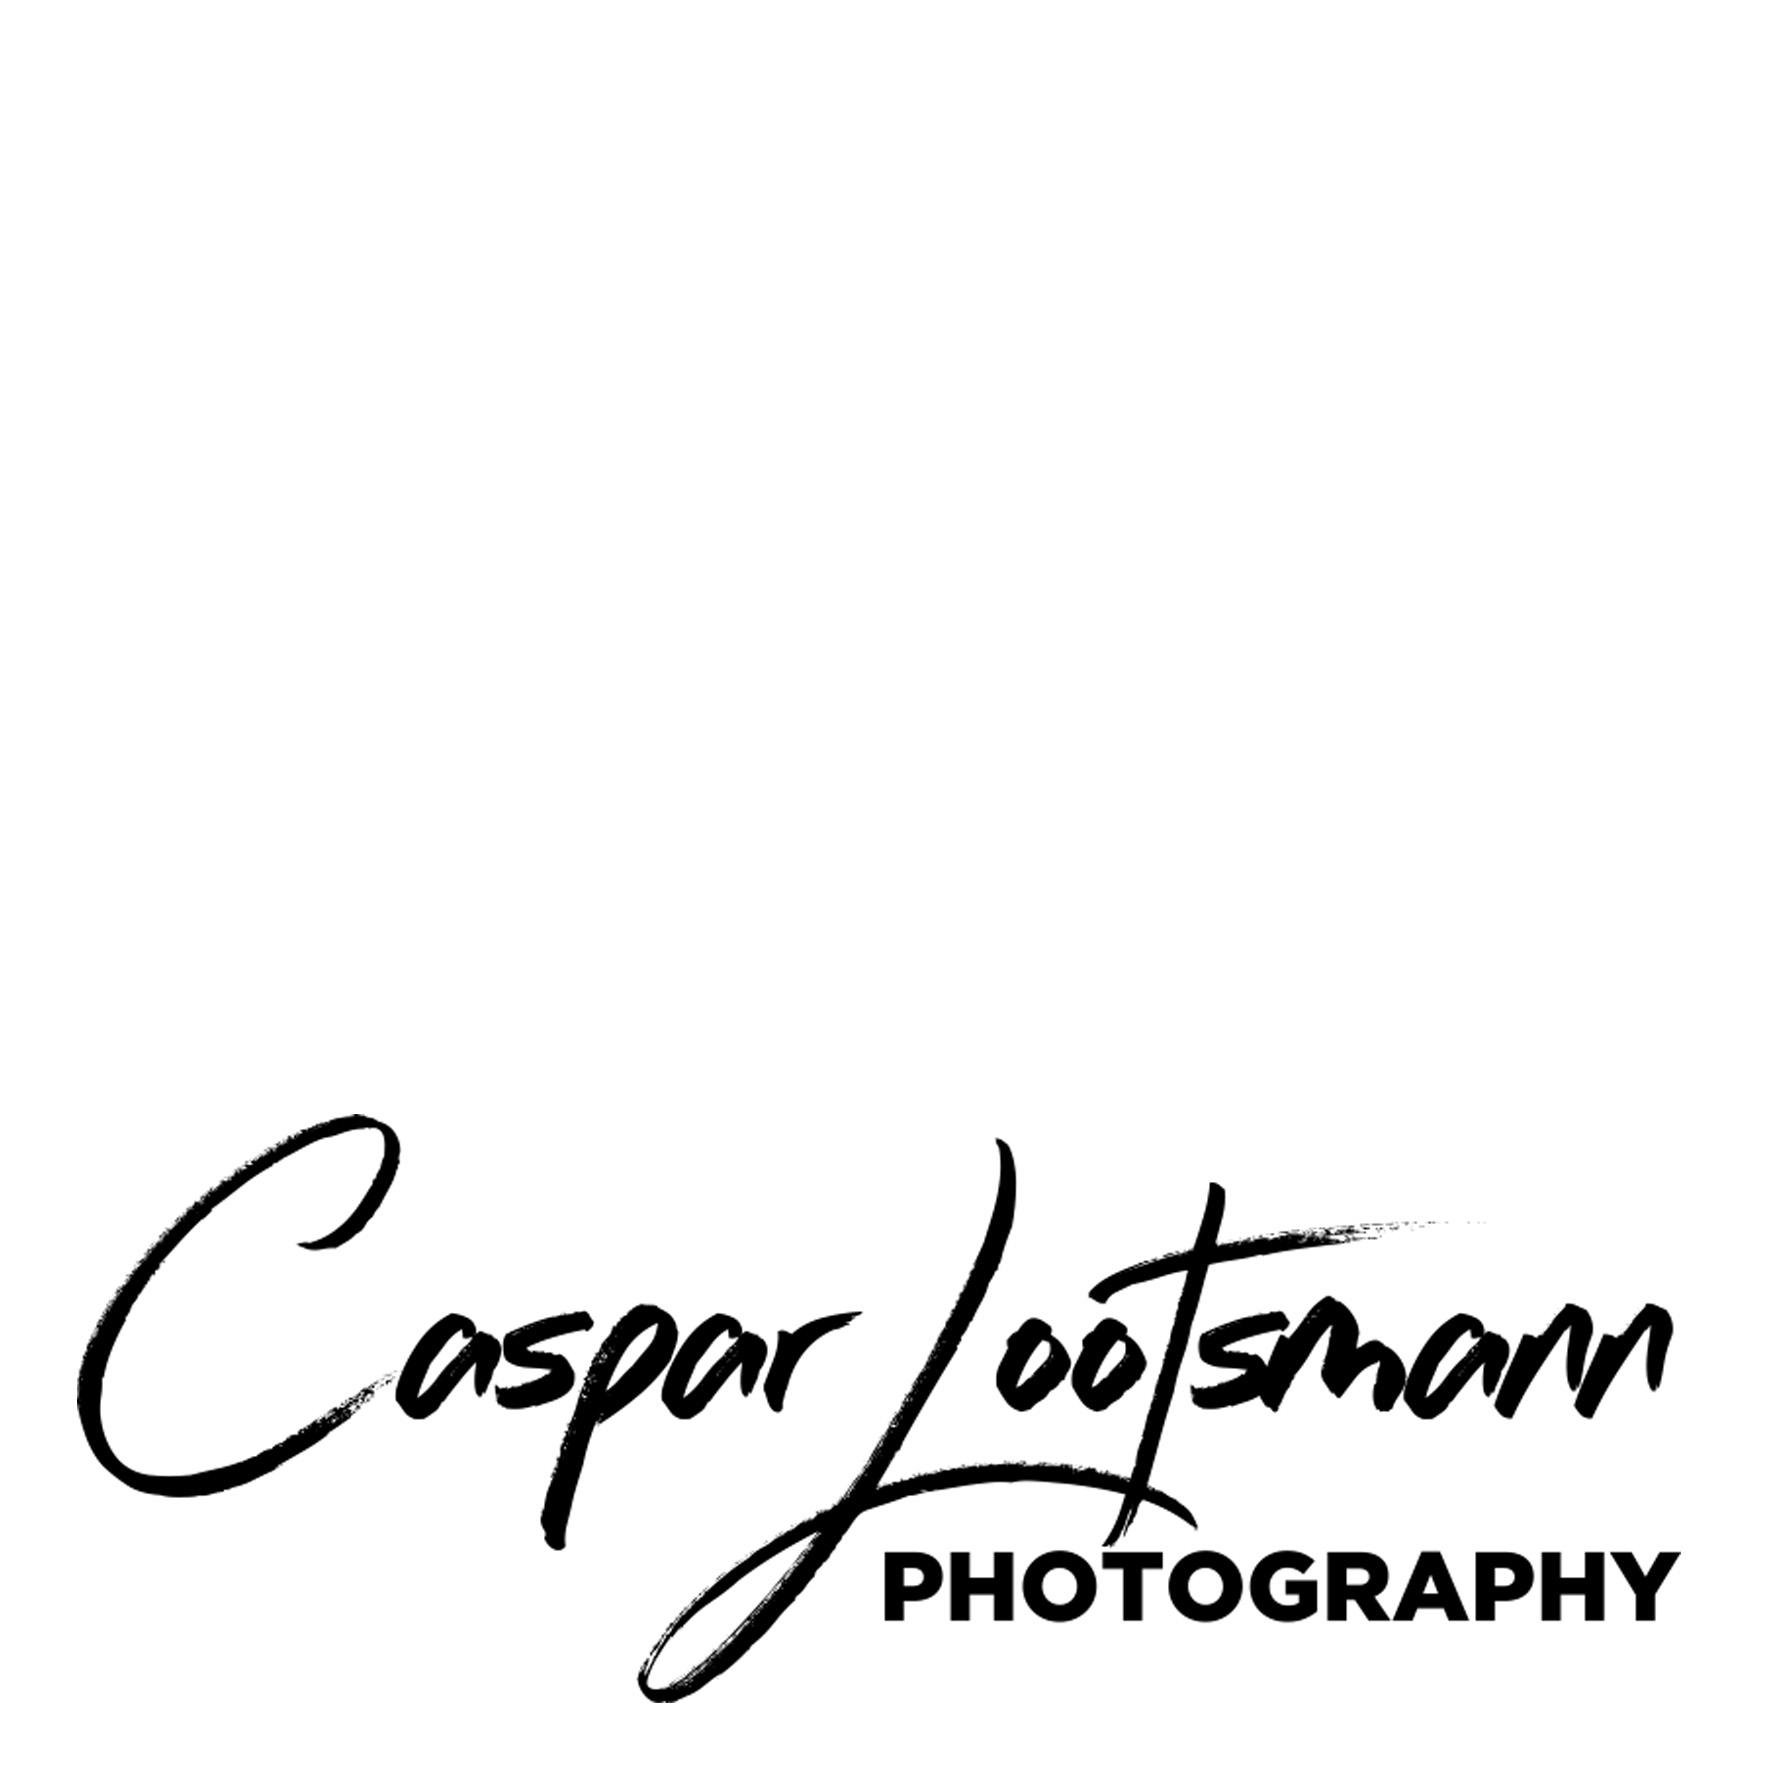 caspar_lootsmann_photography_watermark-black.jpg